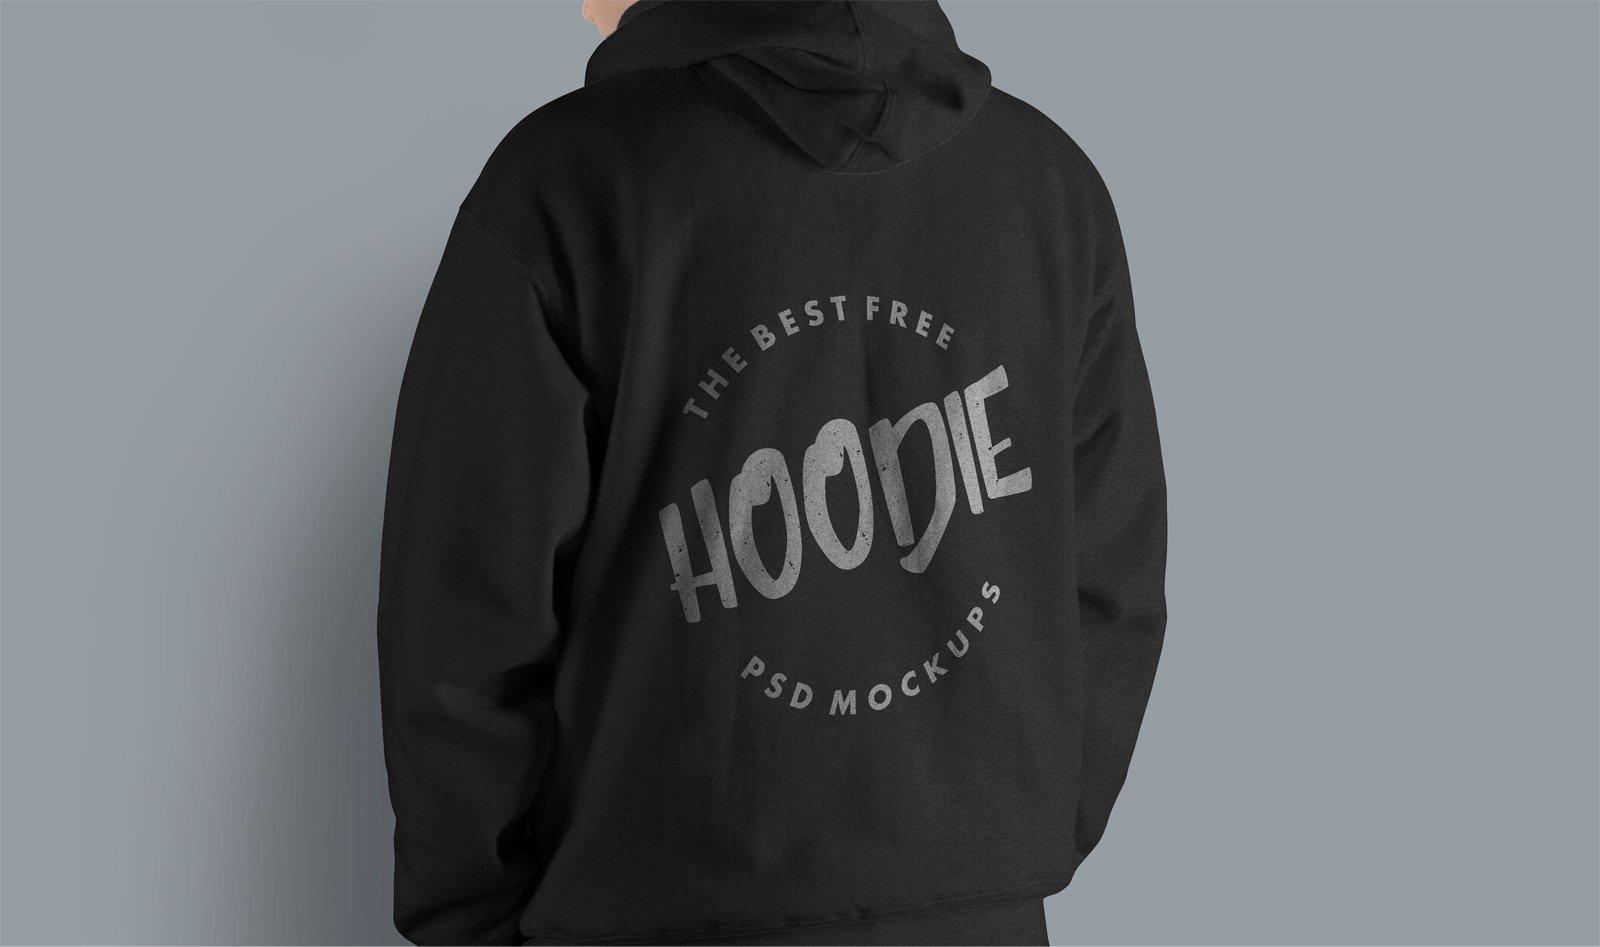 Free Hoodie Mockup Psd Inspirational the Best Free Psd Hoo Mockups Hipsthetic